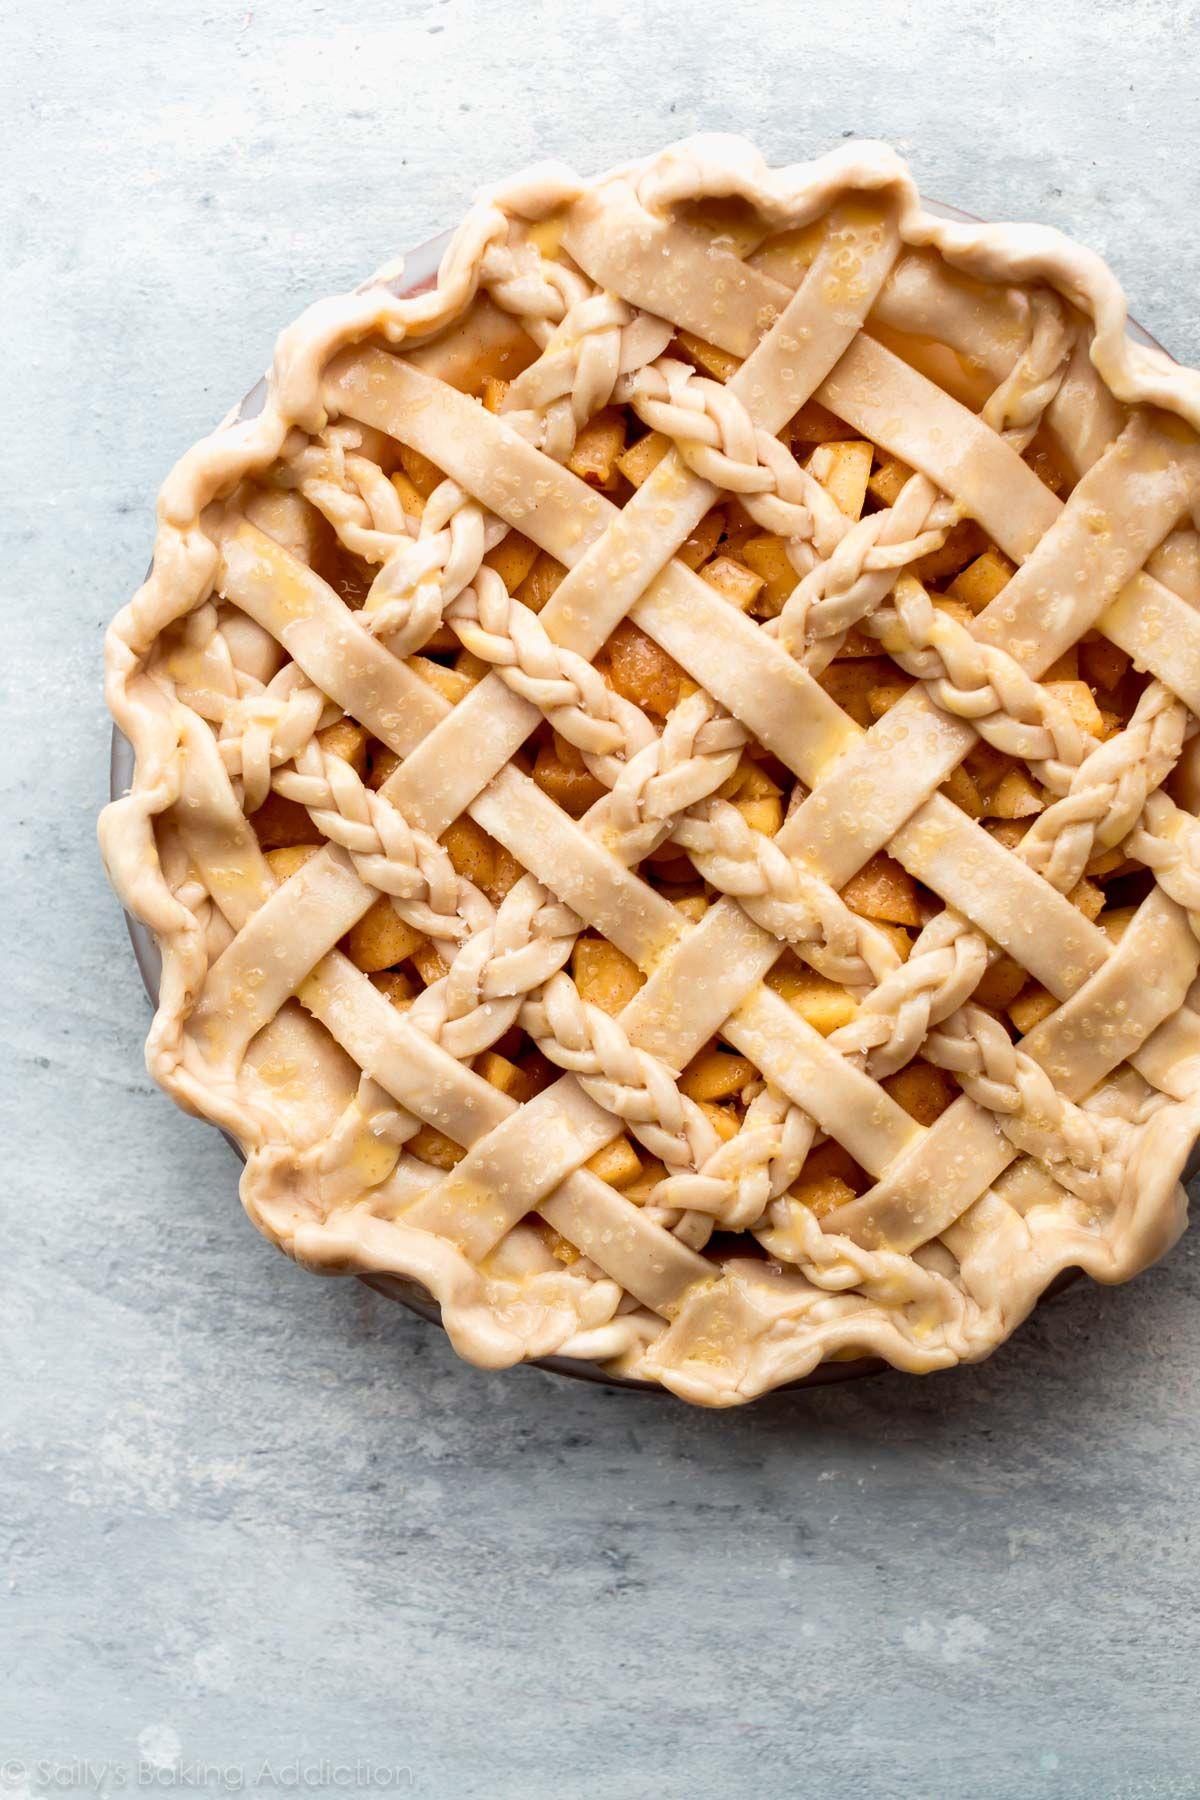 Ginger Peach Pie | Sally's Baking Addiction